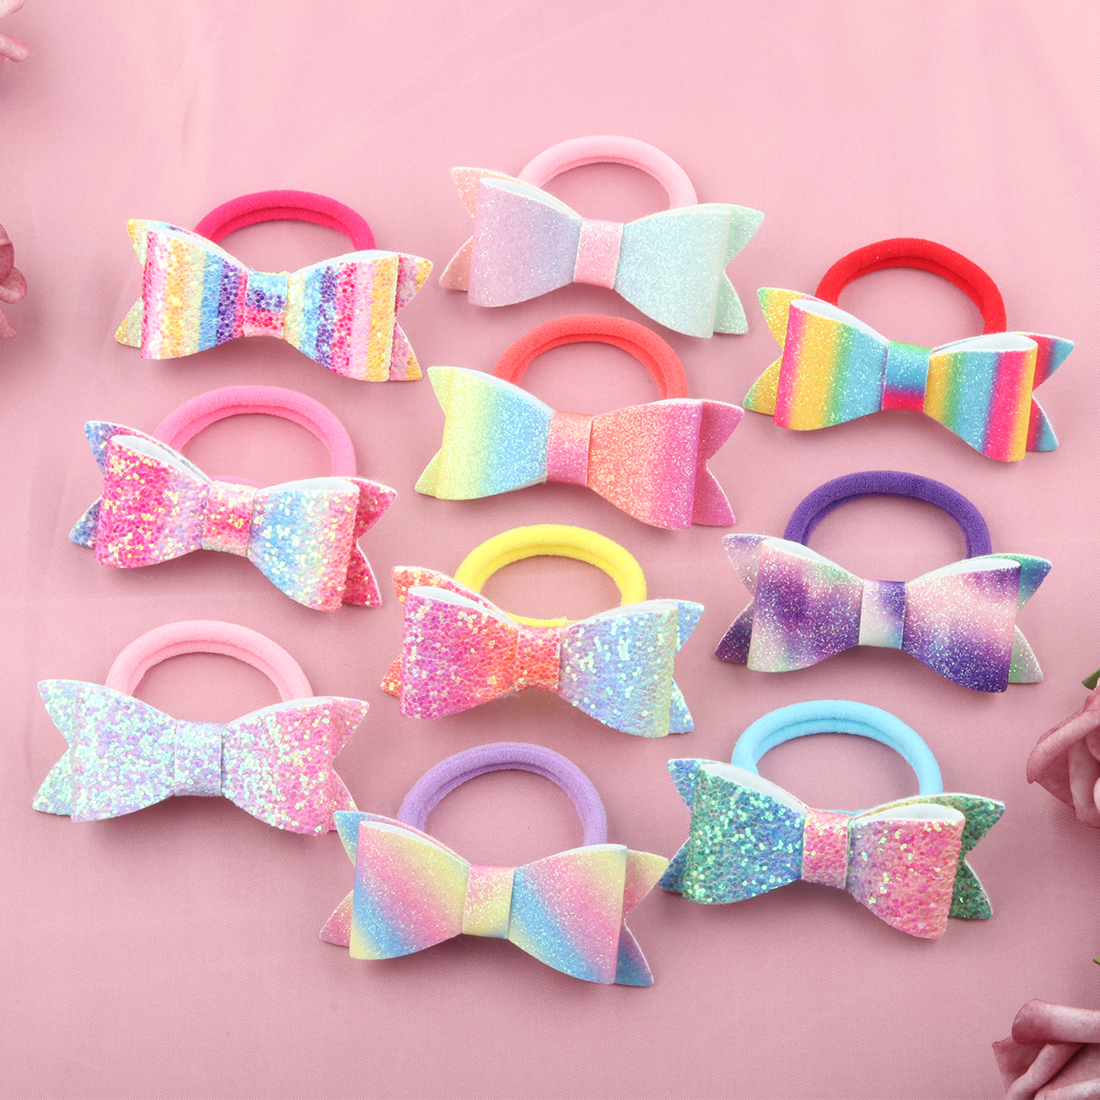 1 PC Child Hair Bow Tie Elastic Hair Band Glitter Hairbow Rope Rainbow Sequin Sparkly  3 Inch Bows Mermaid Girls Sweet Headwear